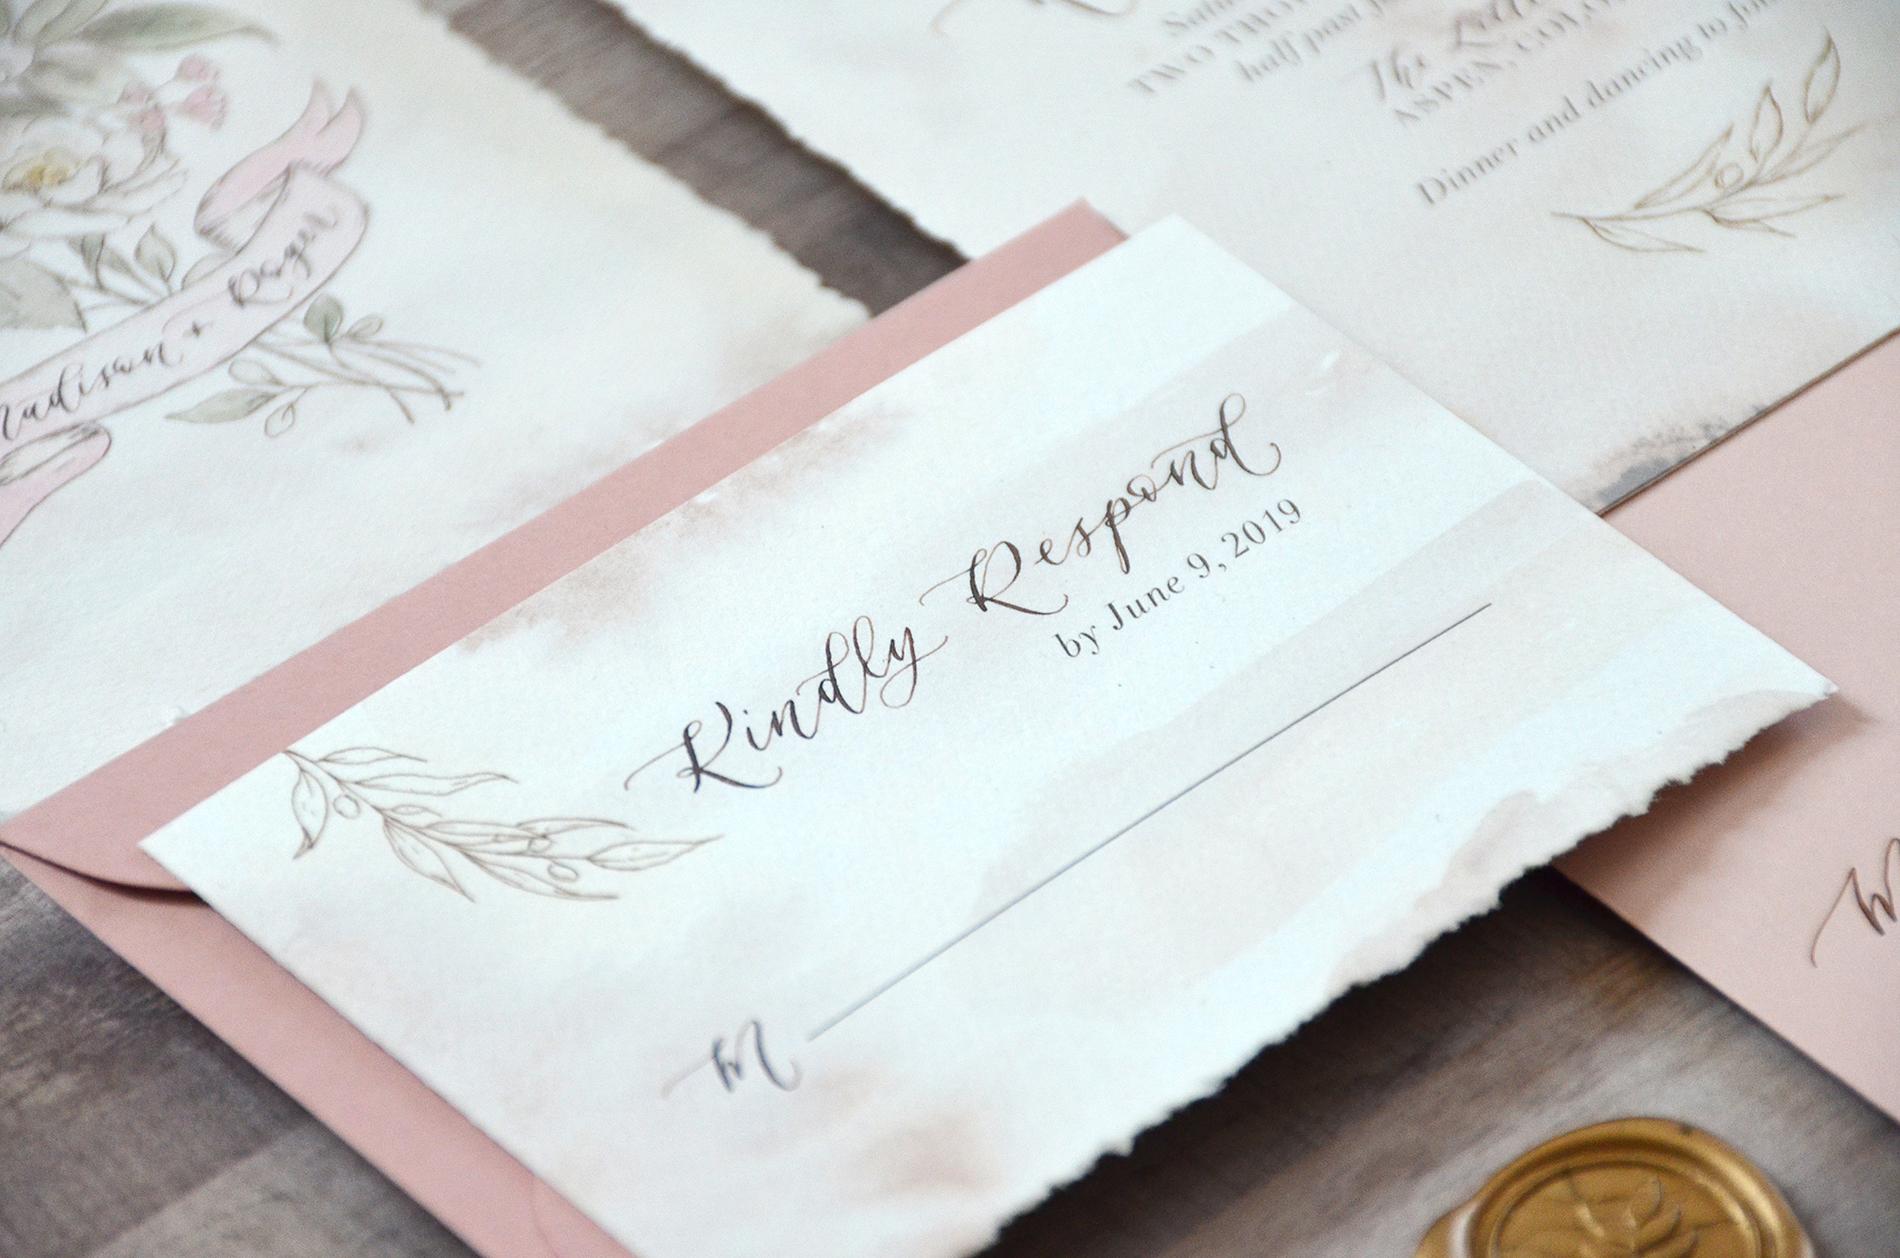 Sam Allen Creates Rose and Floral Botanical Illustrated Wedding Invitation Suite with Handtorn Edges RSVP Card